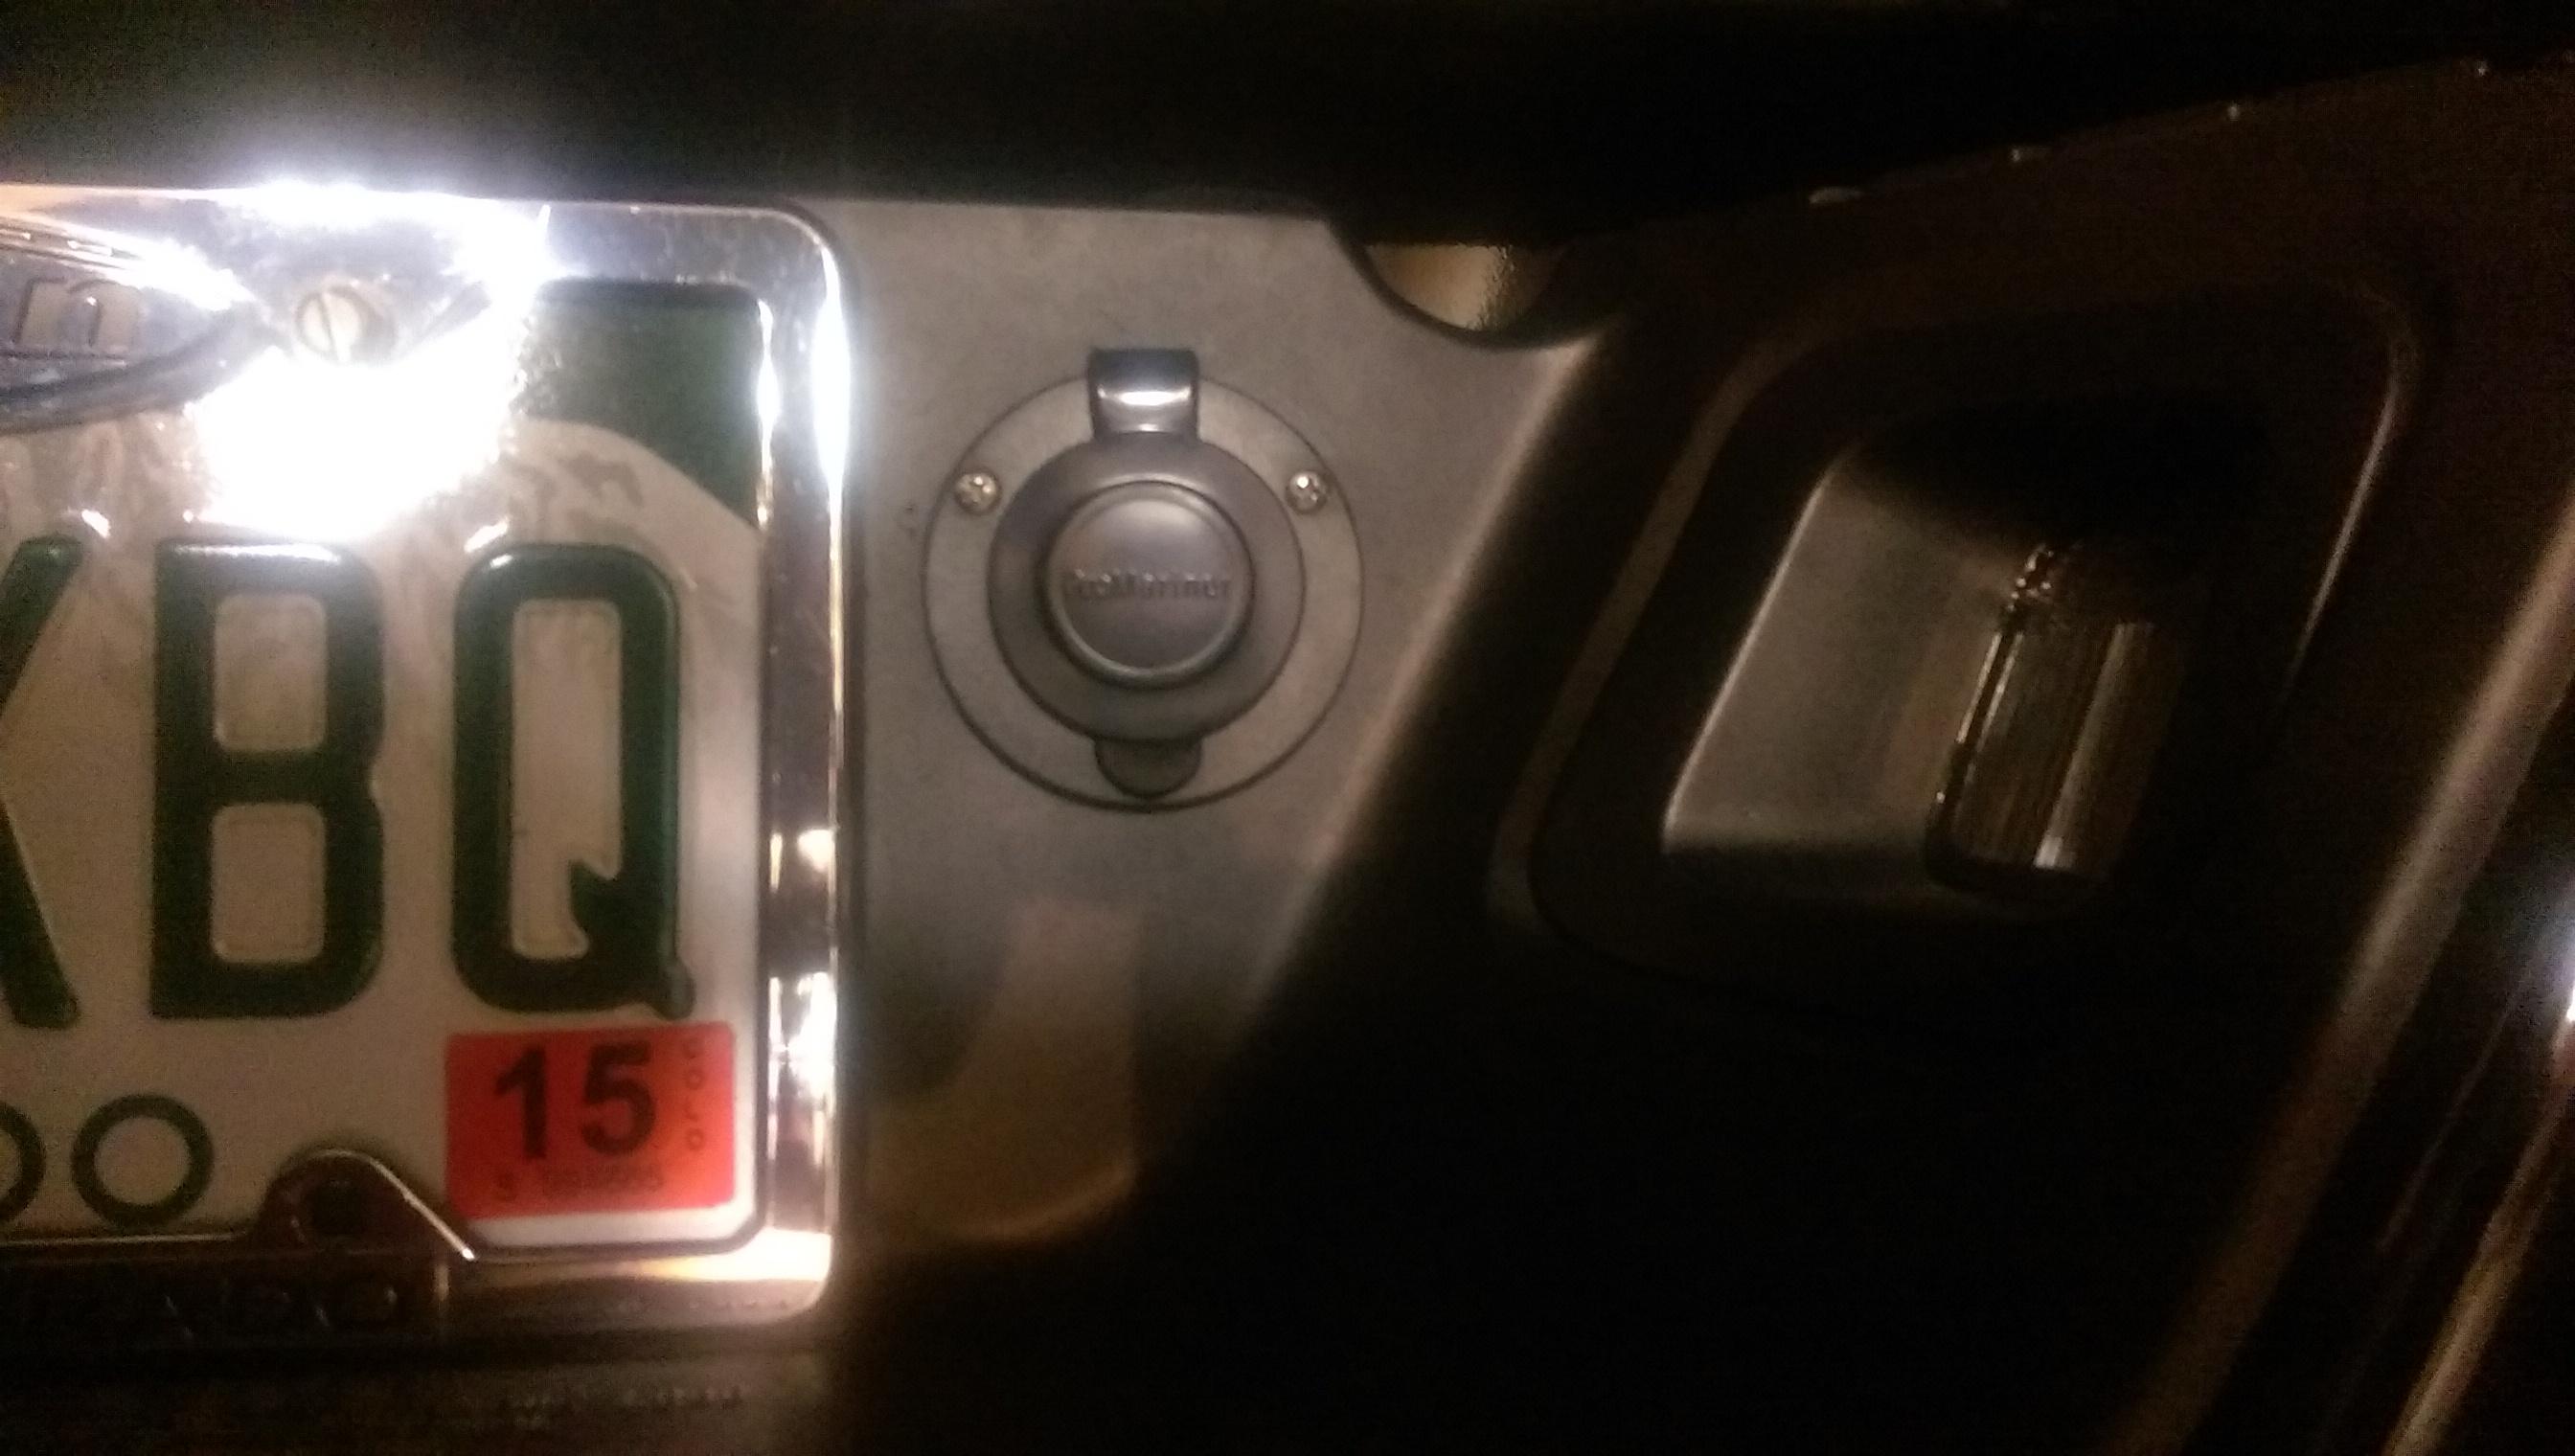 Block Heater Plug Installed In The Rear Bumper